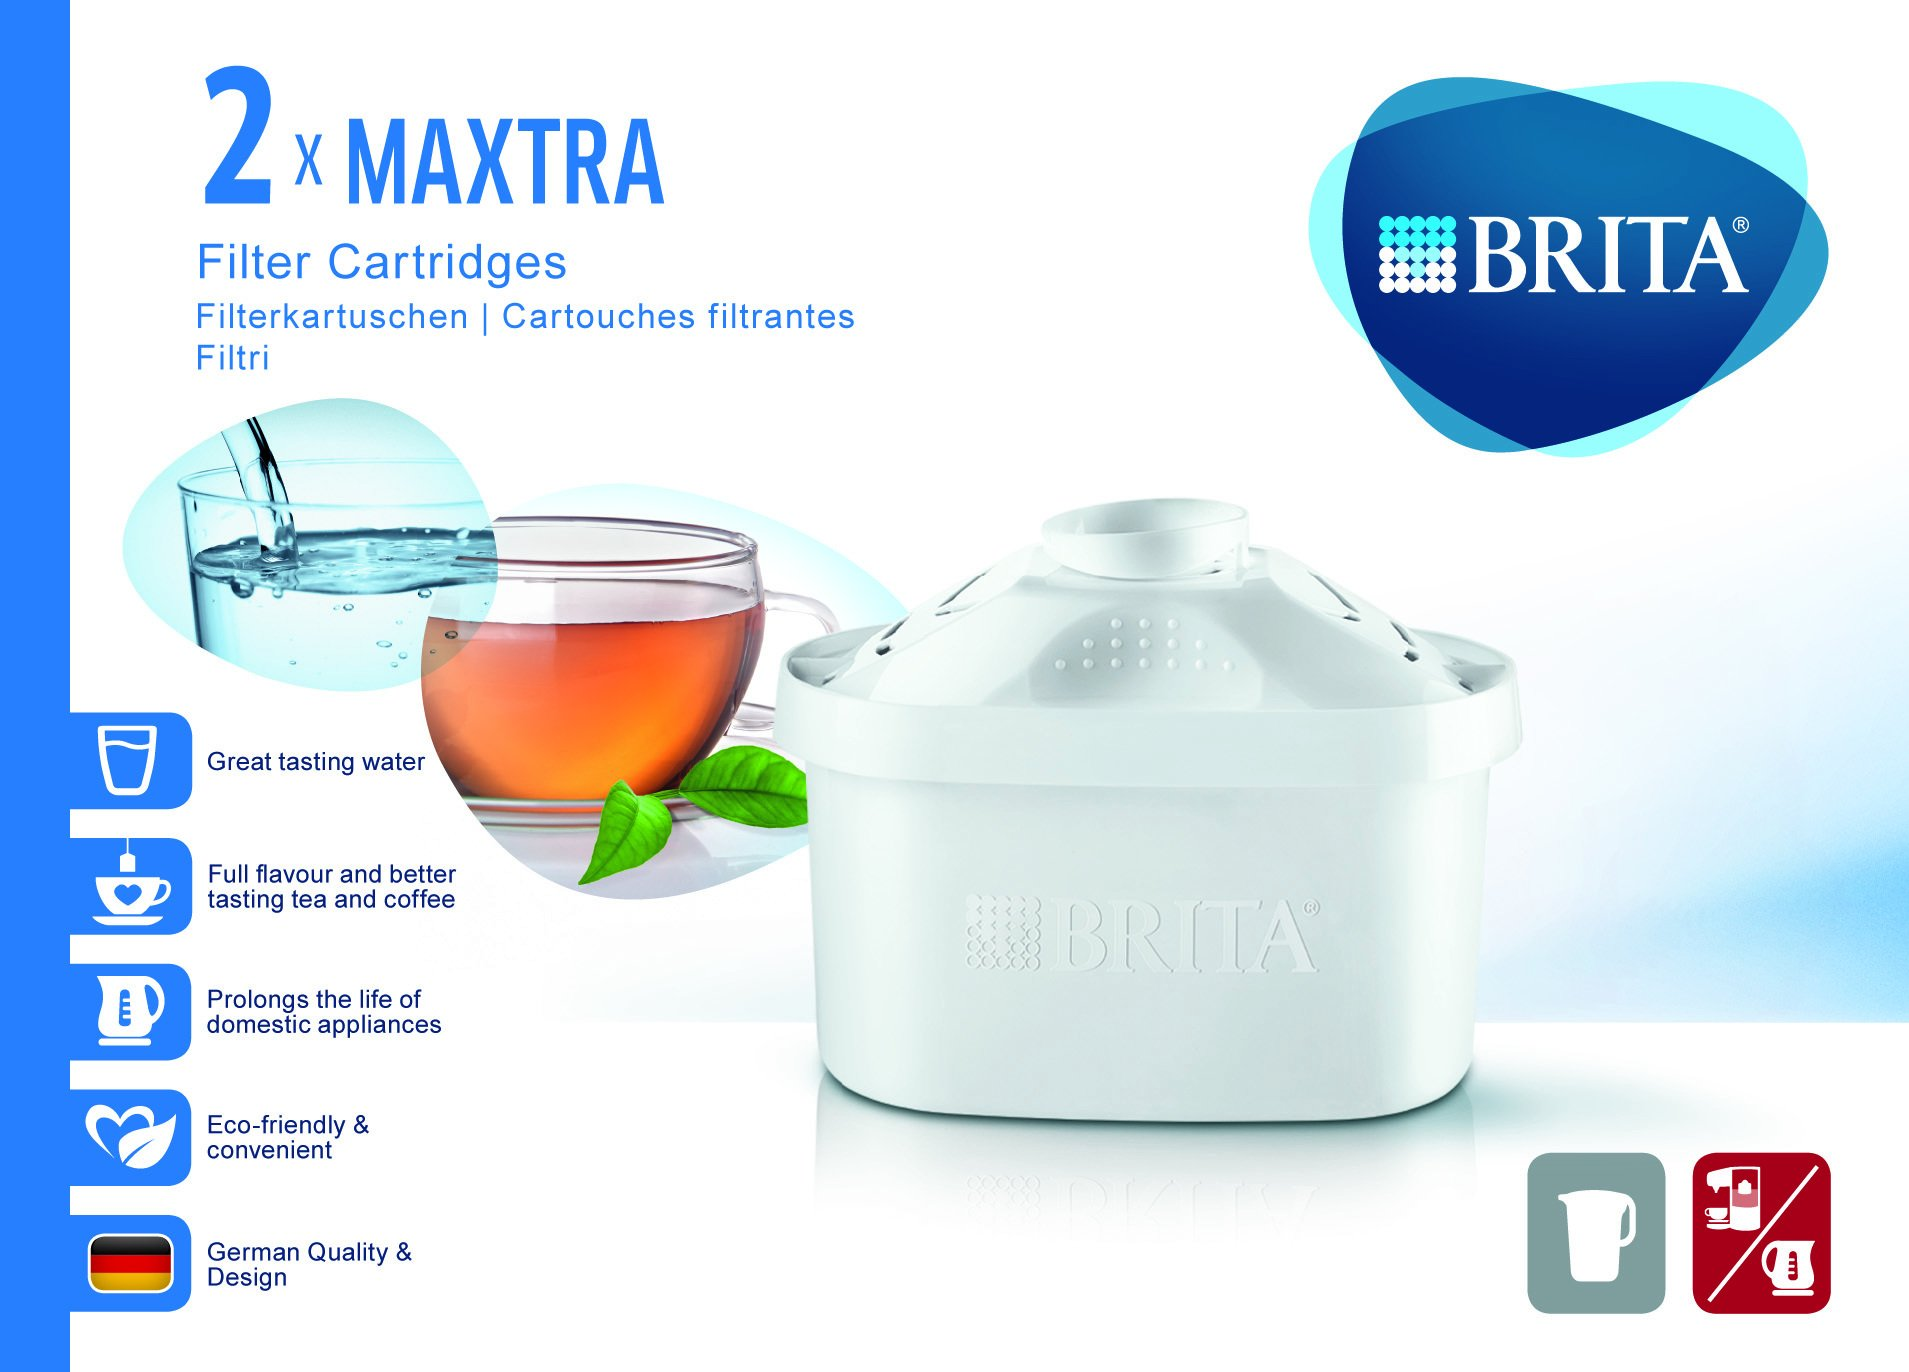 BRITA Mesa Agua Filtro de Cartucho Maxtra de purificador de Agua OVP neutralizador de Agua: Amazon.es: Hogar